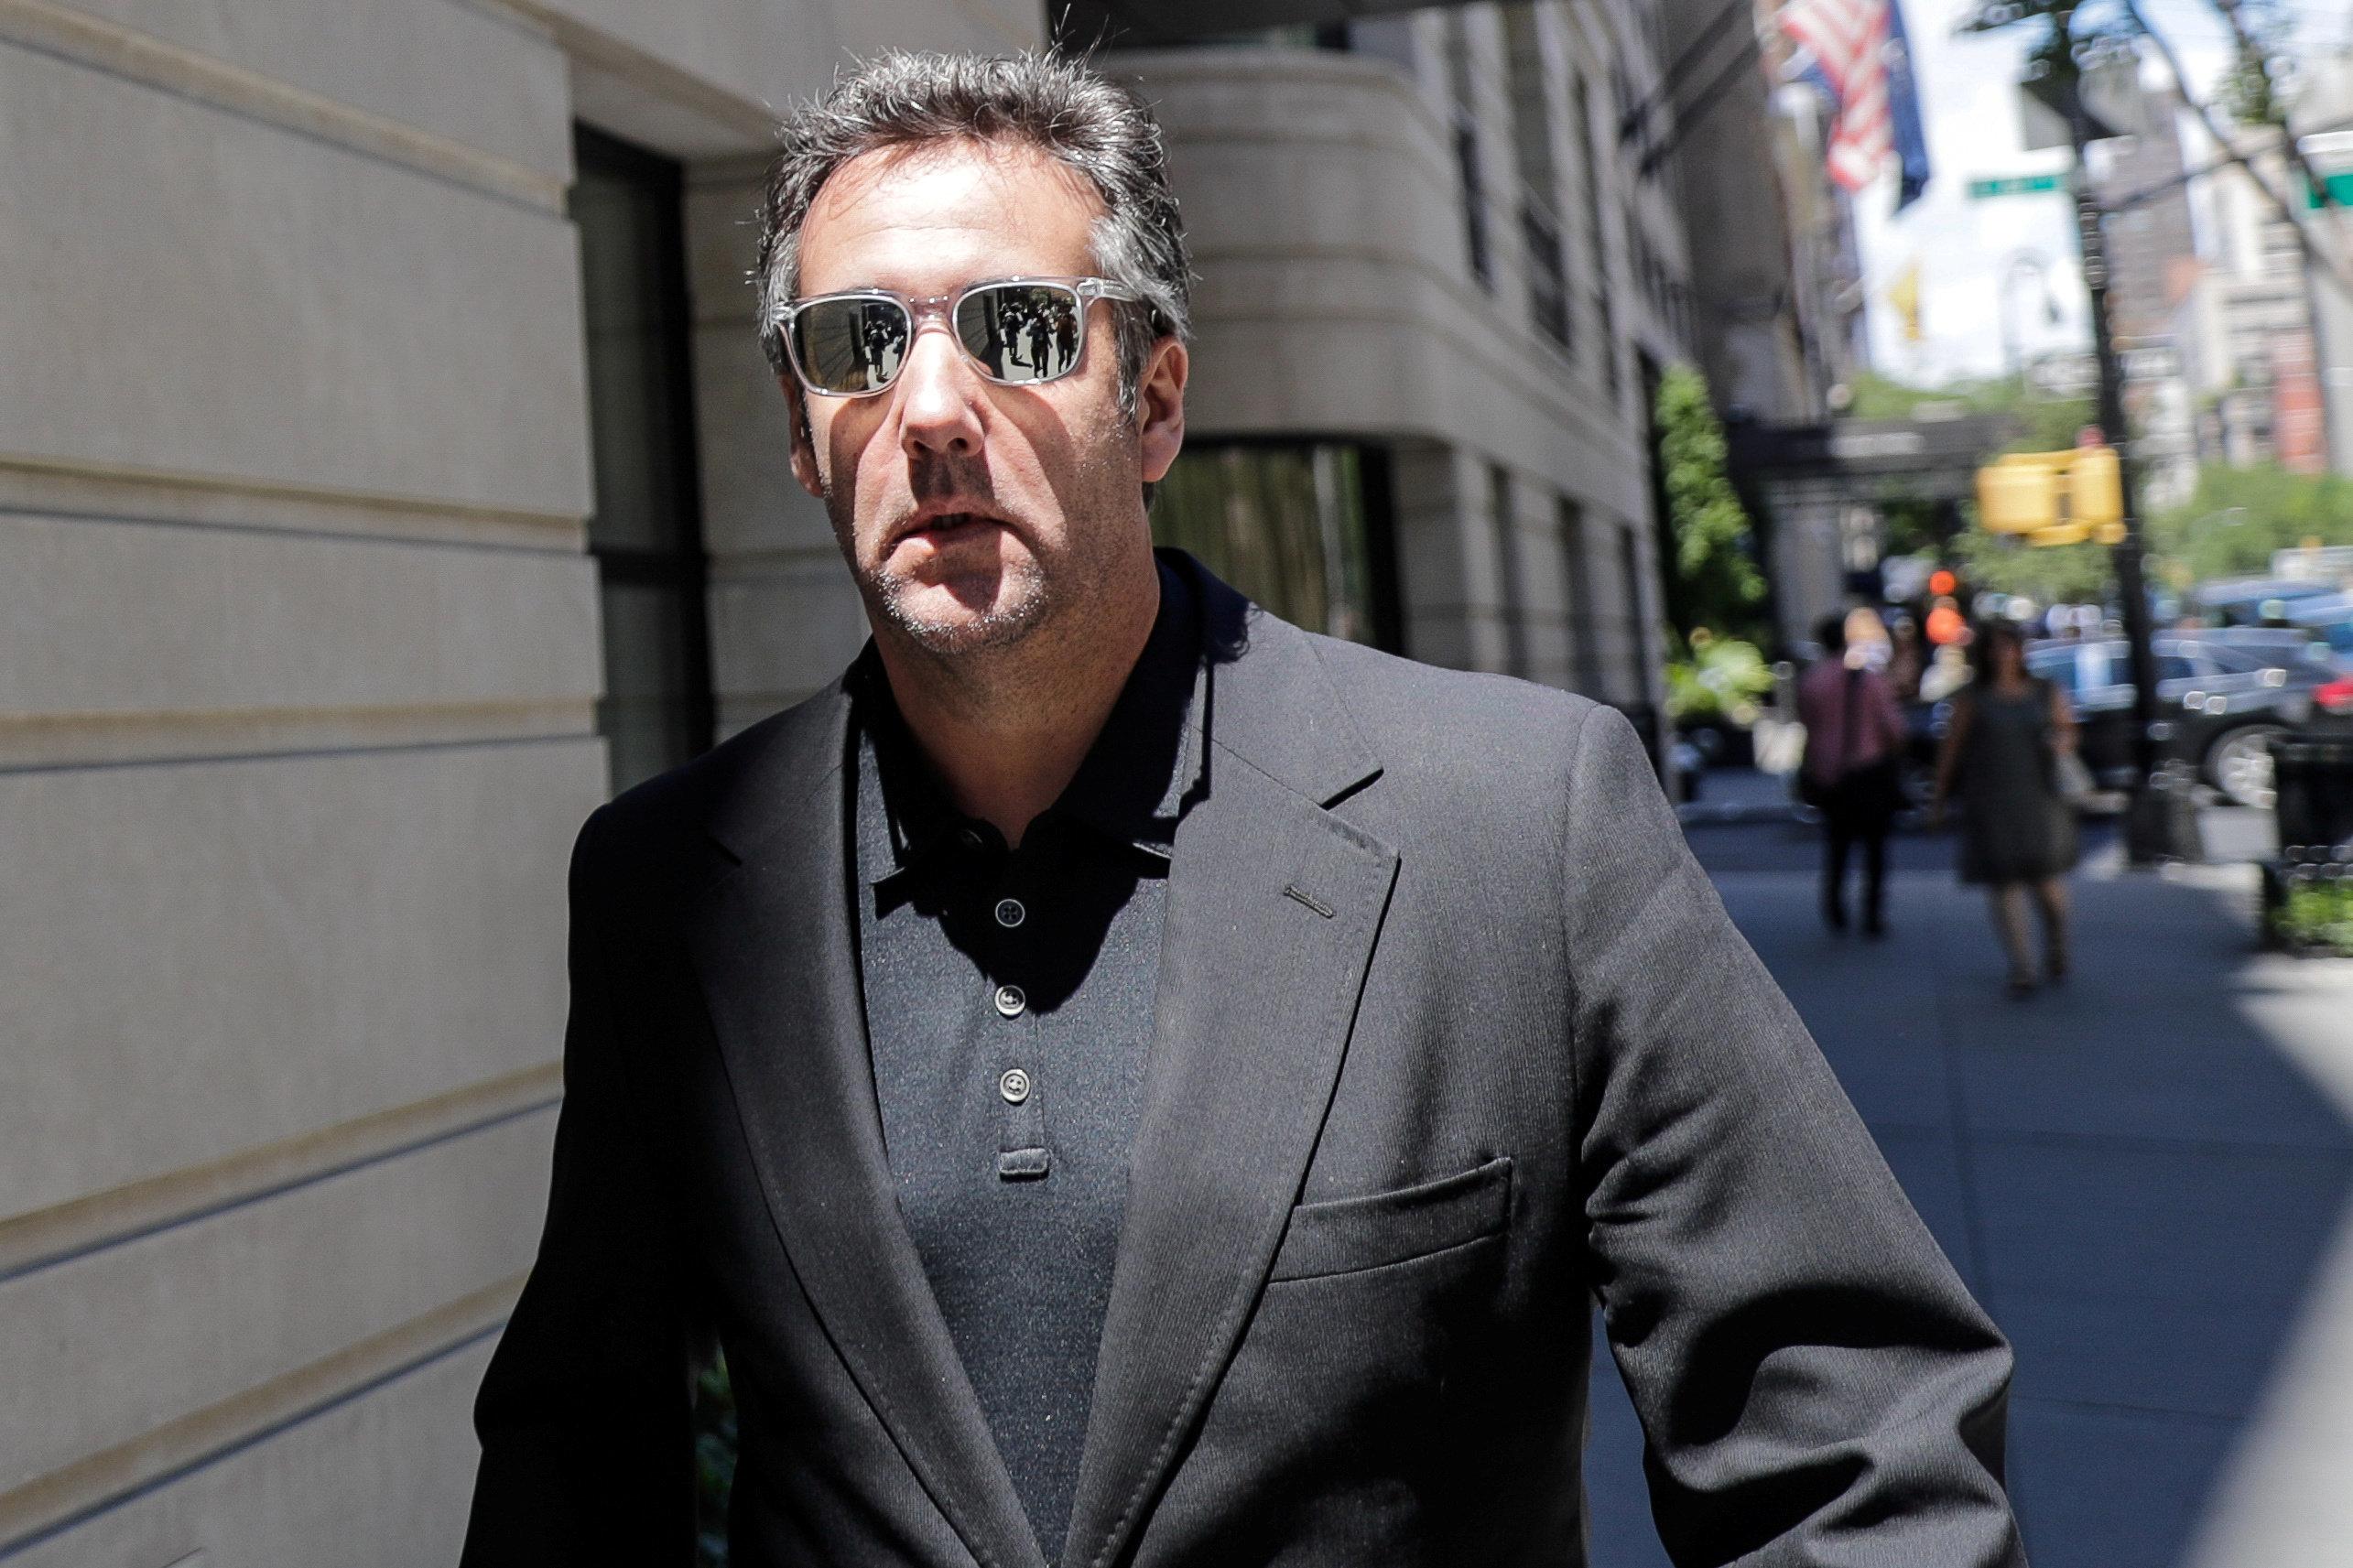 U.S. President Donald Trump's lawyer Michael Cohen leaves his hotel in the Manhattan borough of New York City, New York, U.S., June 15, 2018. REUTERS/Jeenah Moon